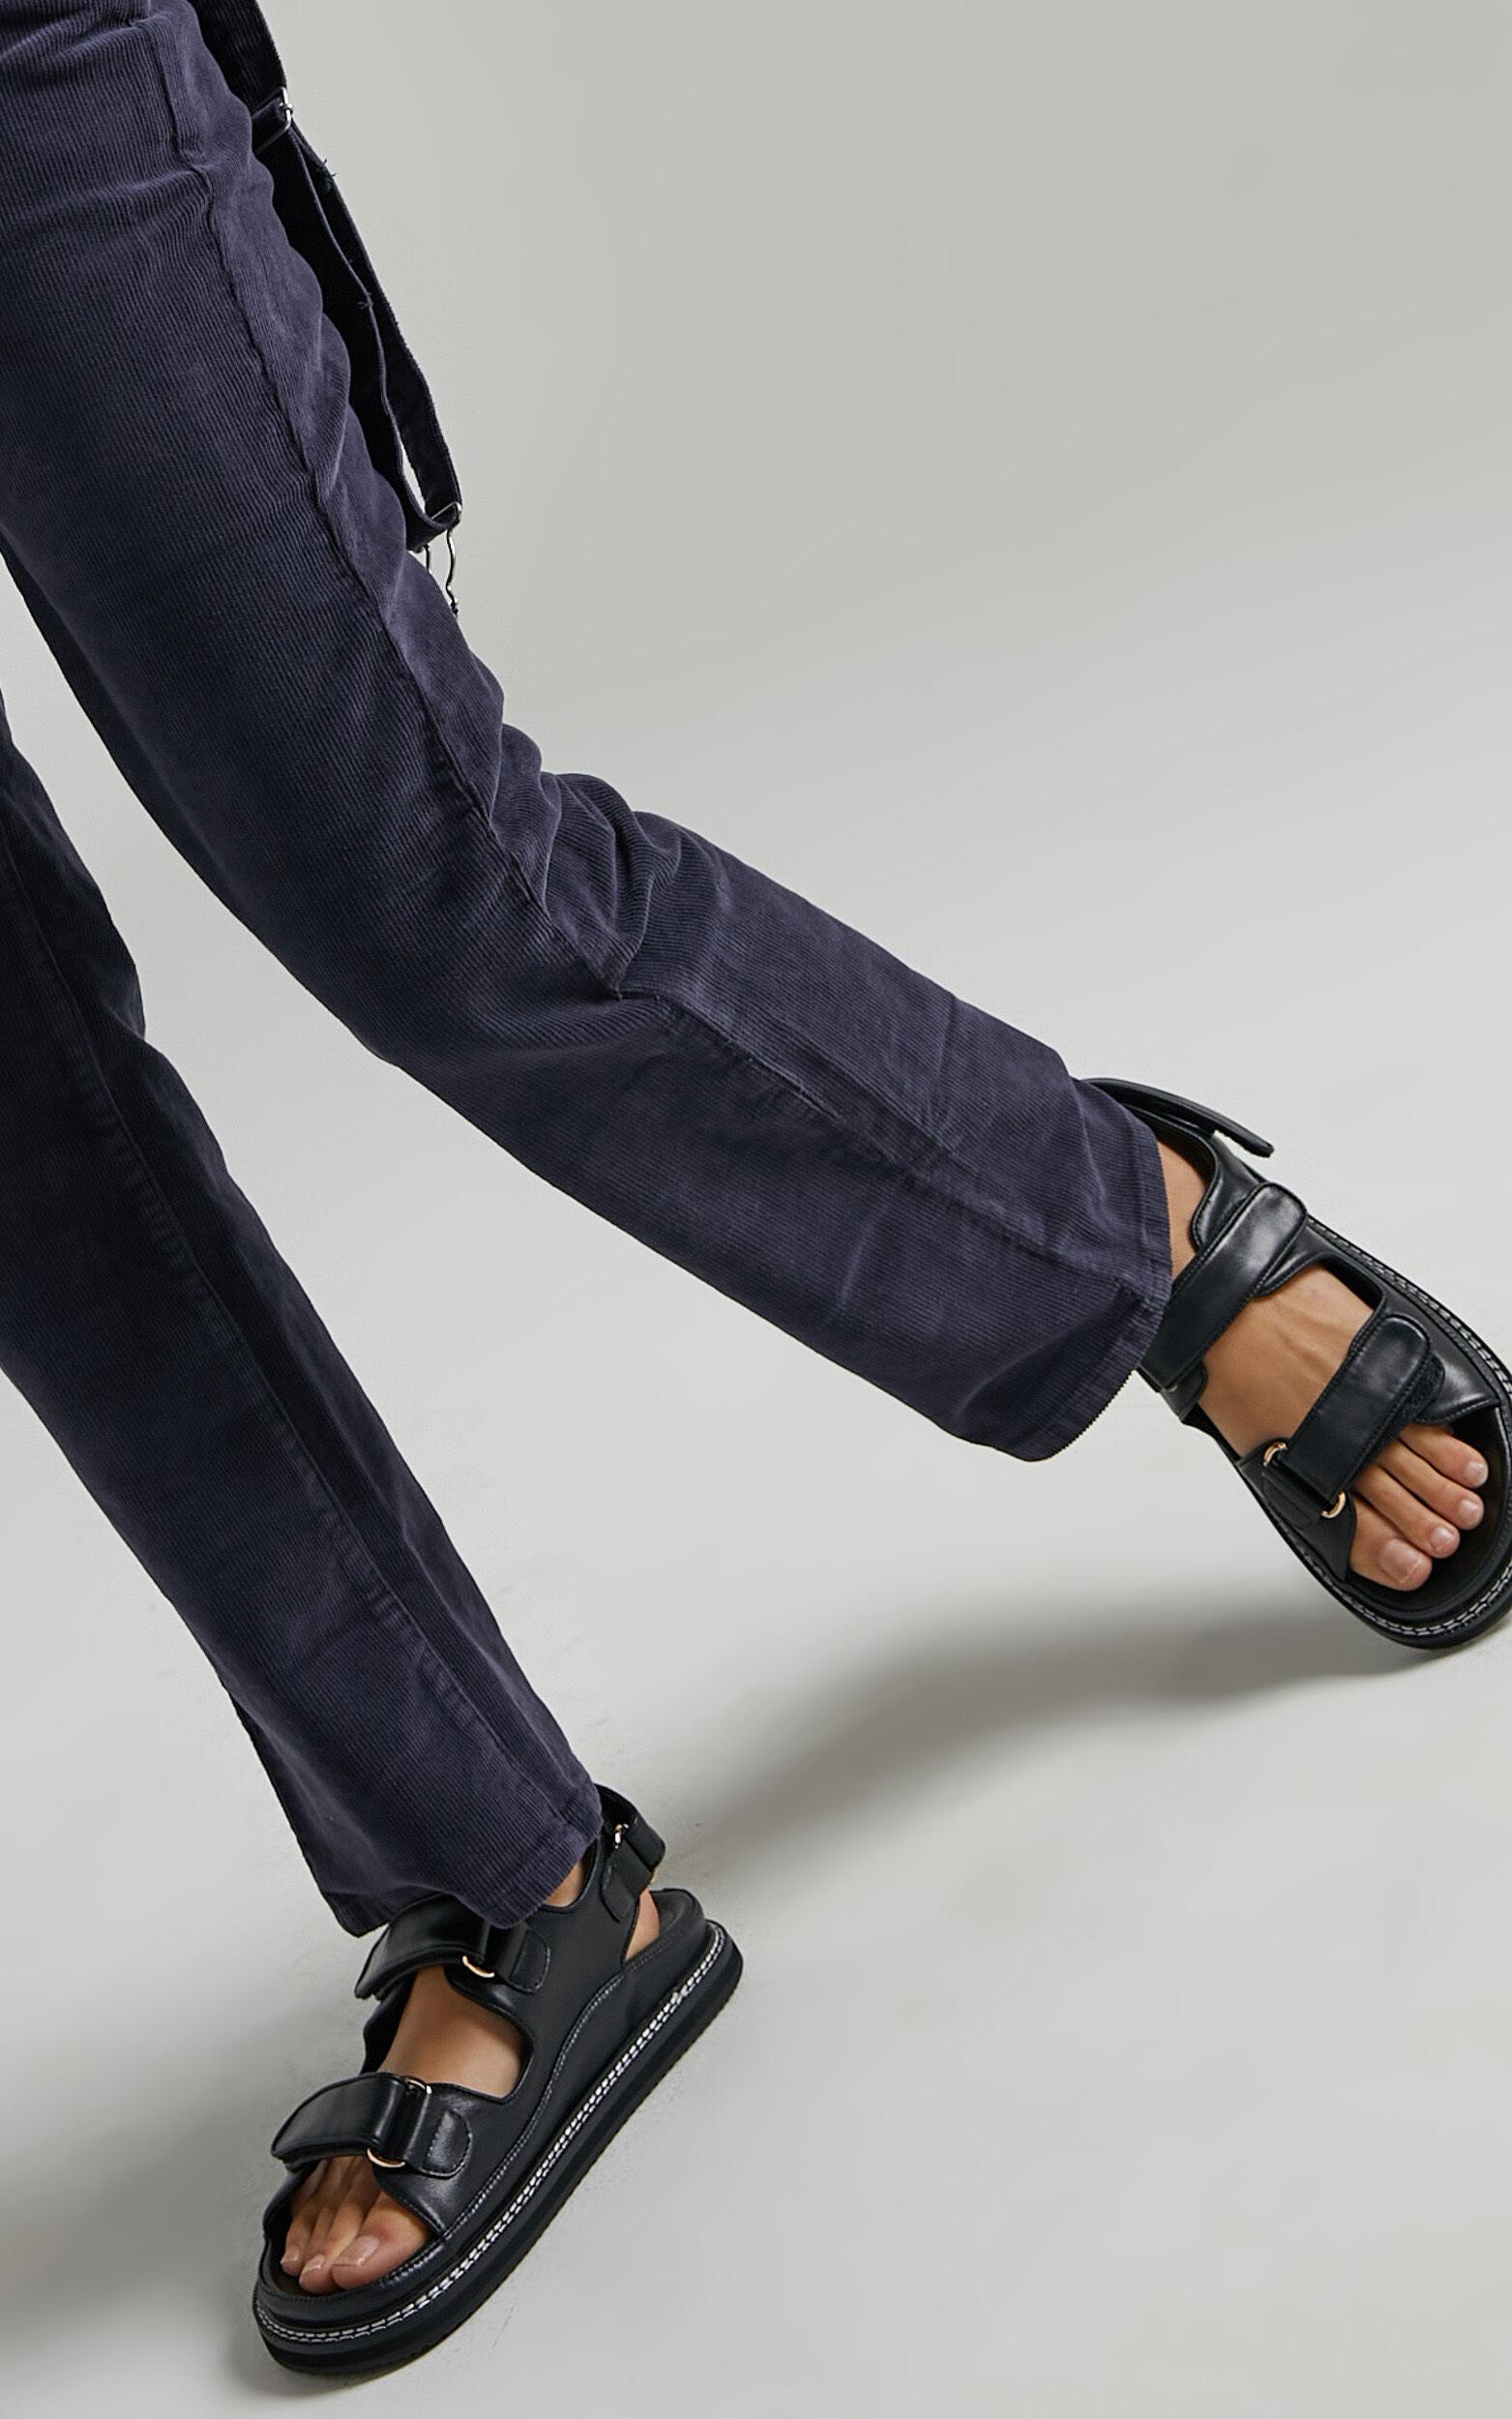 Alias Mae - Pascoe Sandals in Black Leather - 10.5, BLK1, super-hi-res image number null